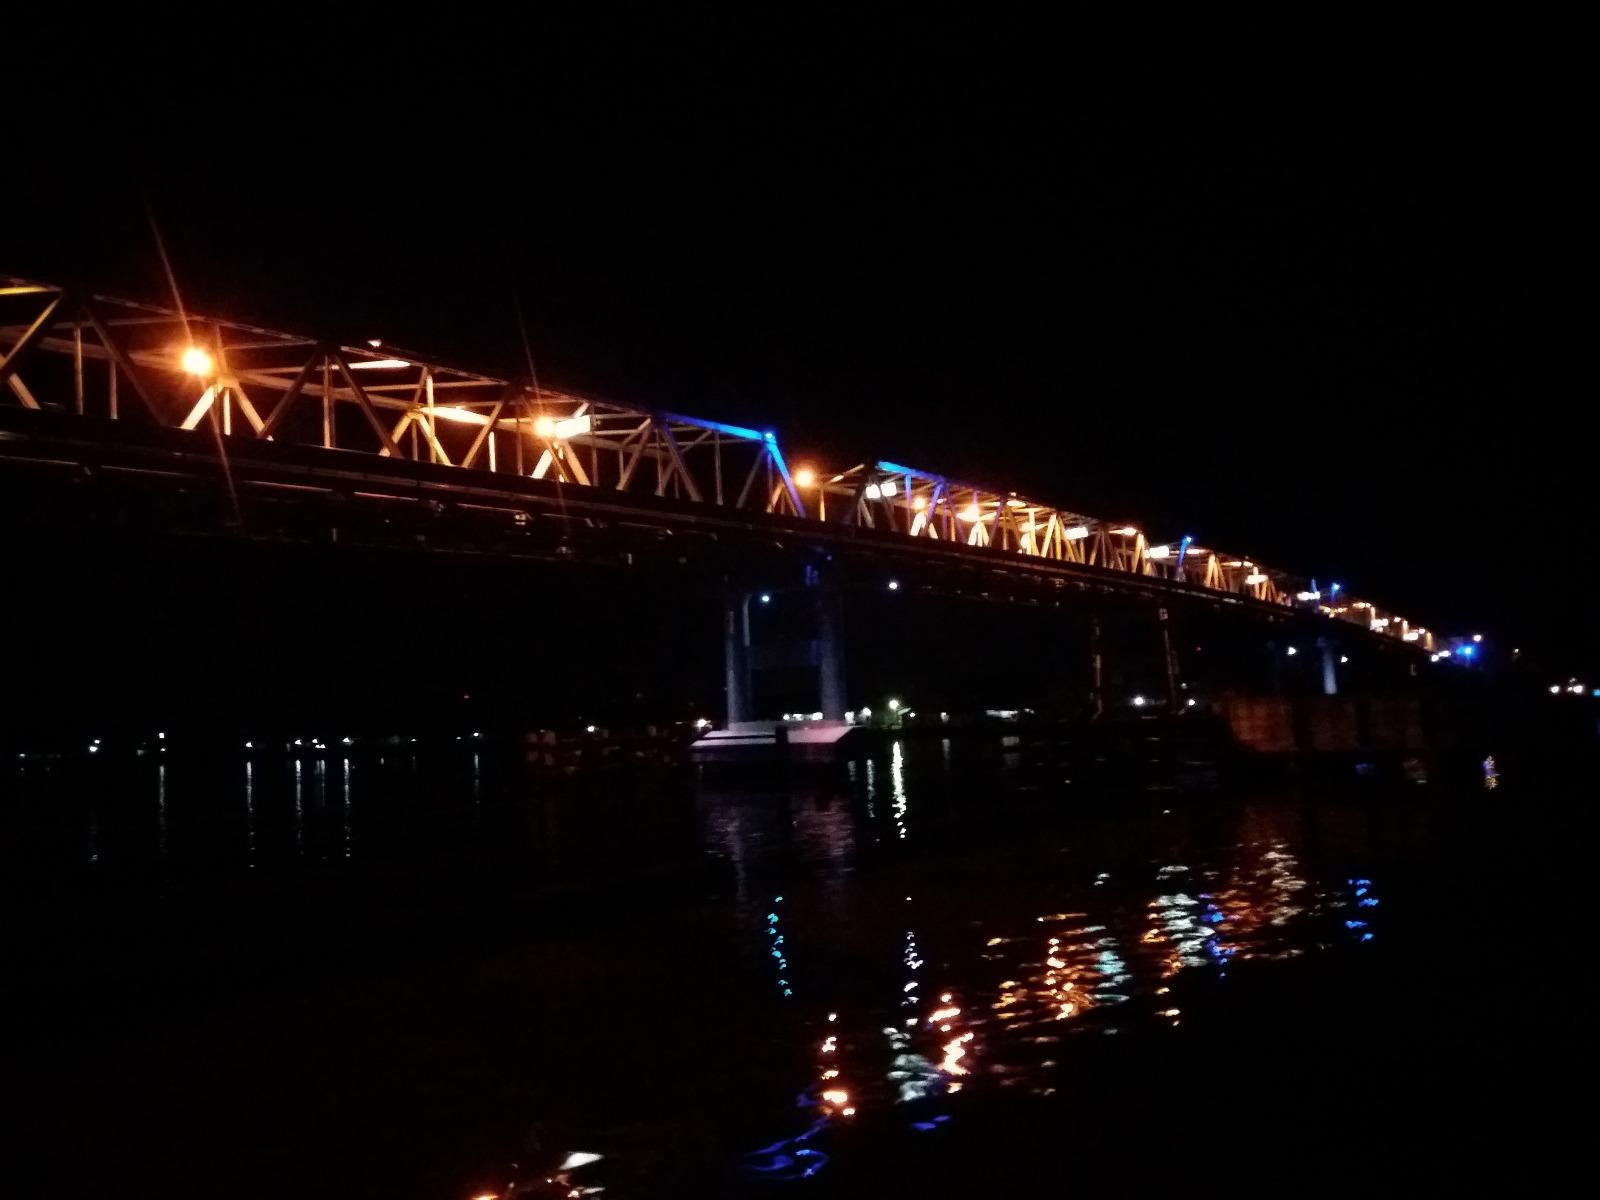 Kapal Bandong Dan Wisata Malam Sungai Kapuas